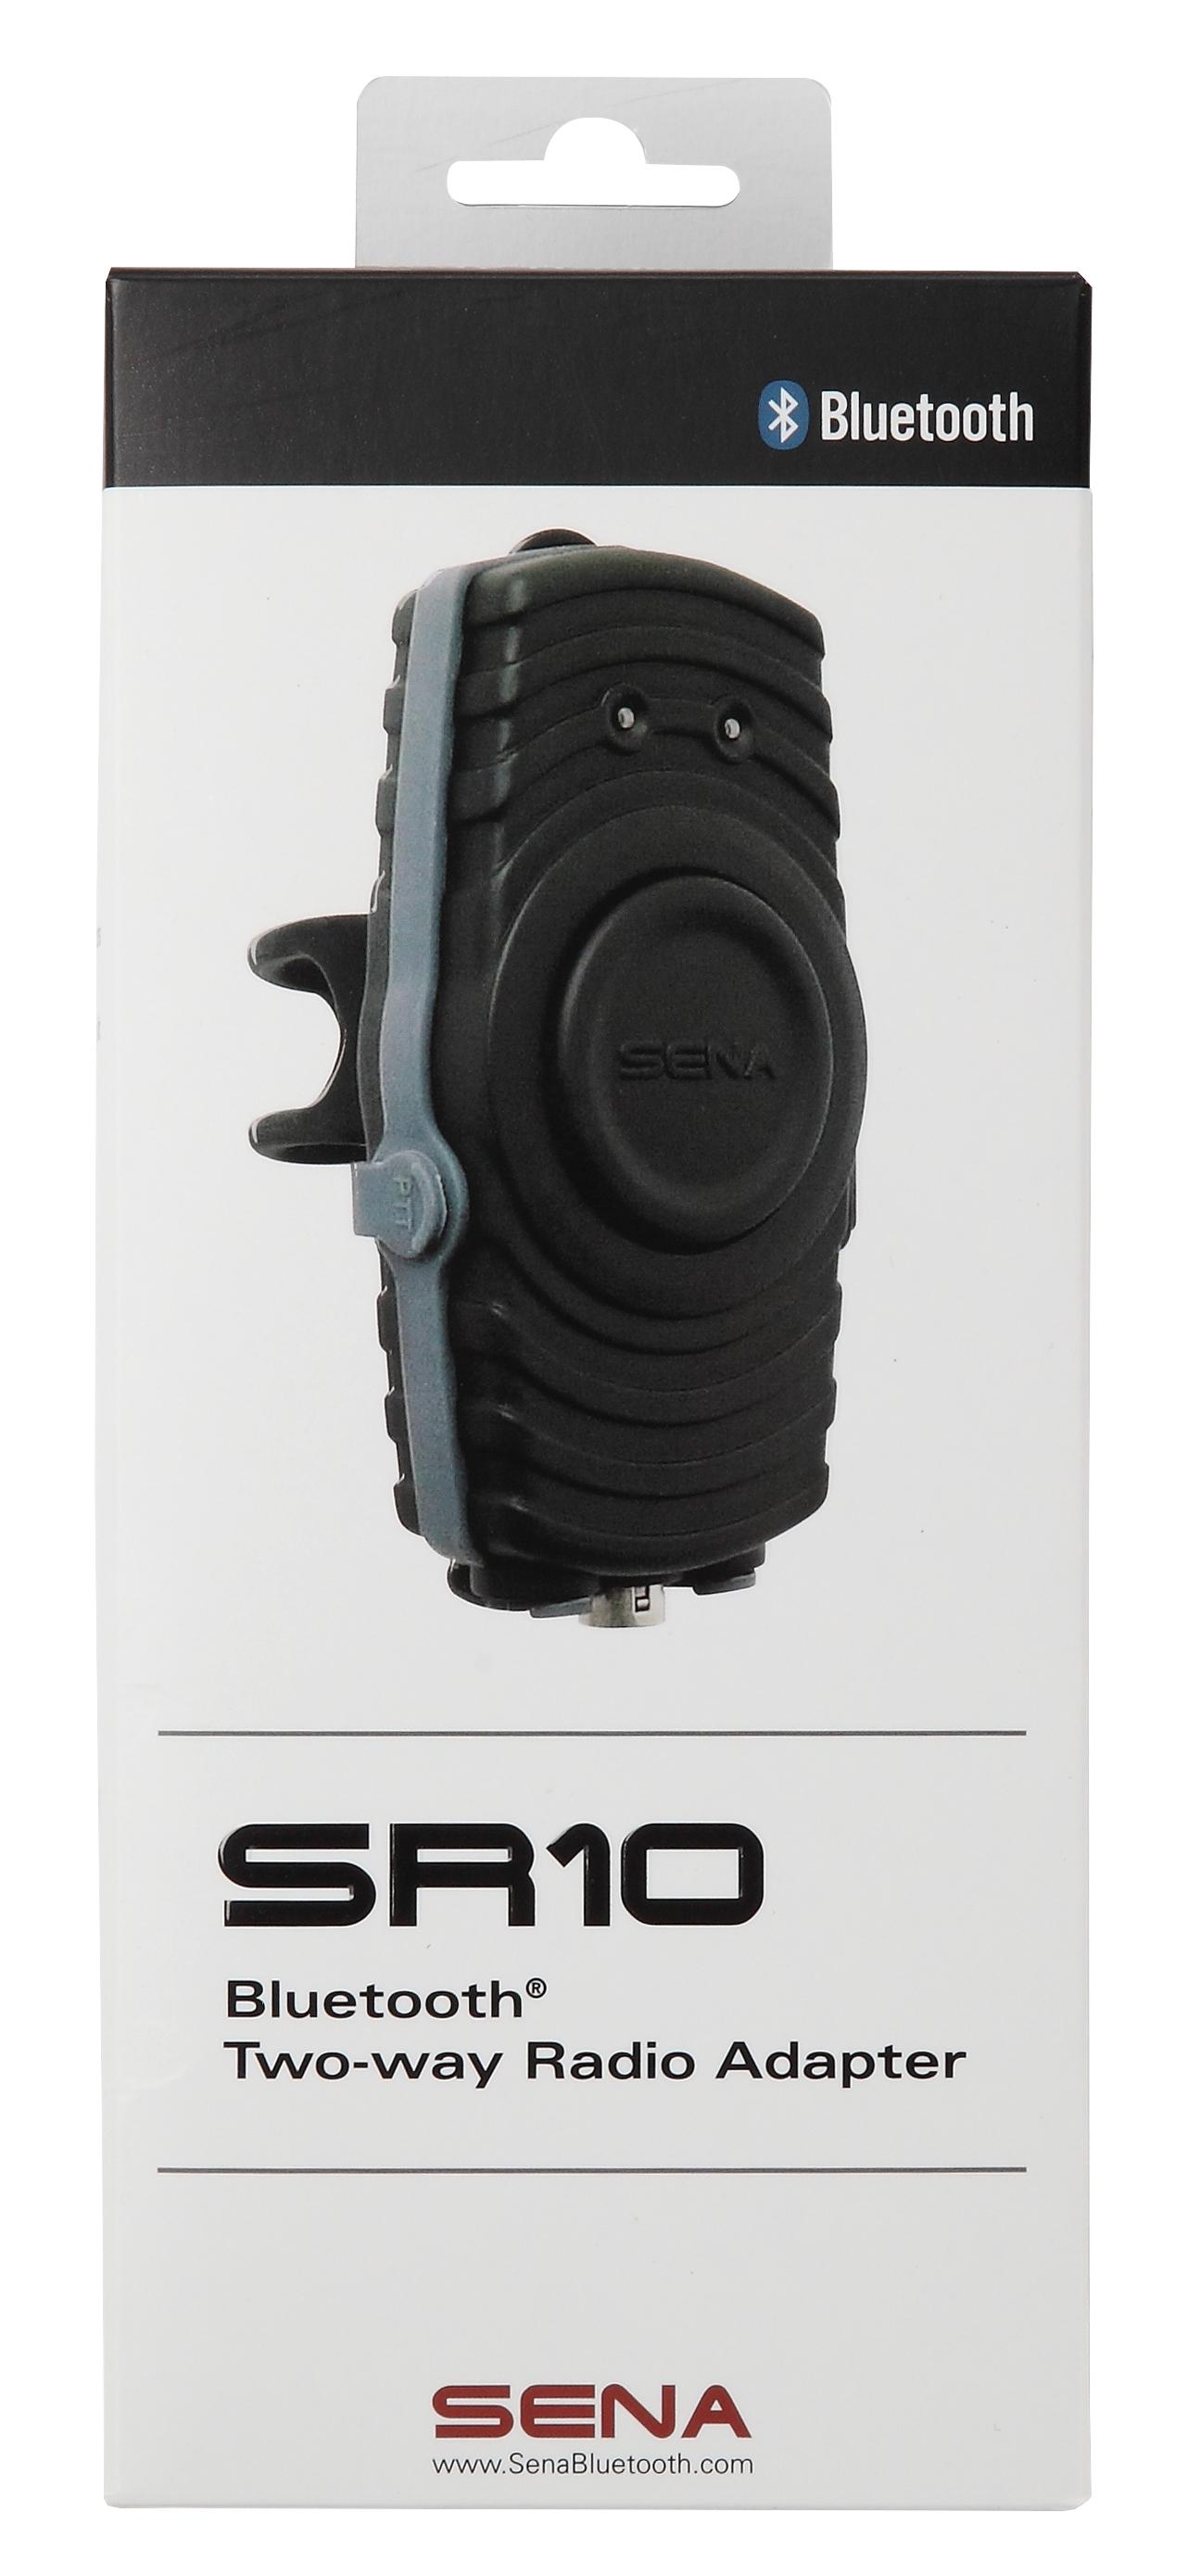 SR10-10 双方向無線機器用Bluetoothアダプター